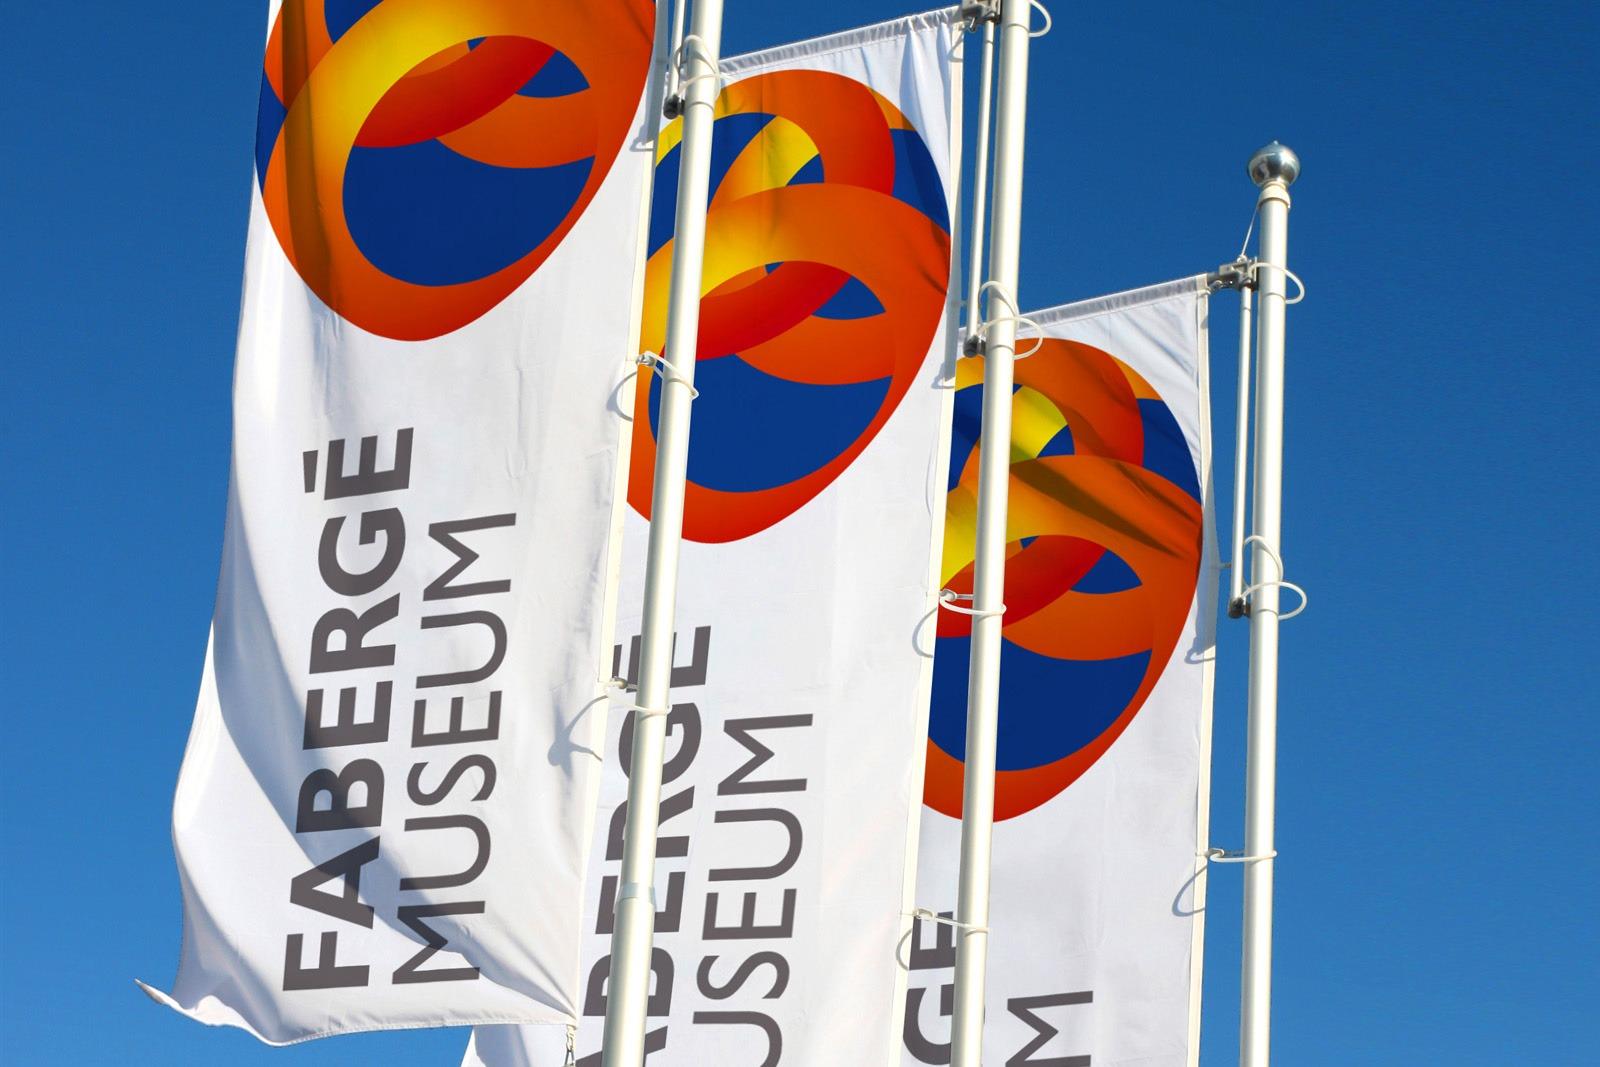 Агентство Асгард, дизайн флагов, фирменный стиль, Музей Фаберже, Fabergé Museum identity